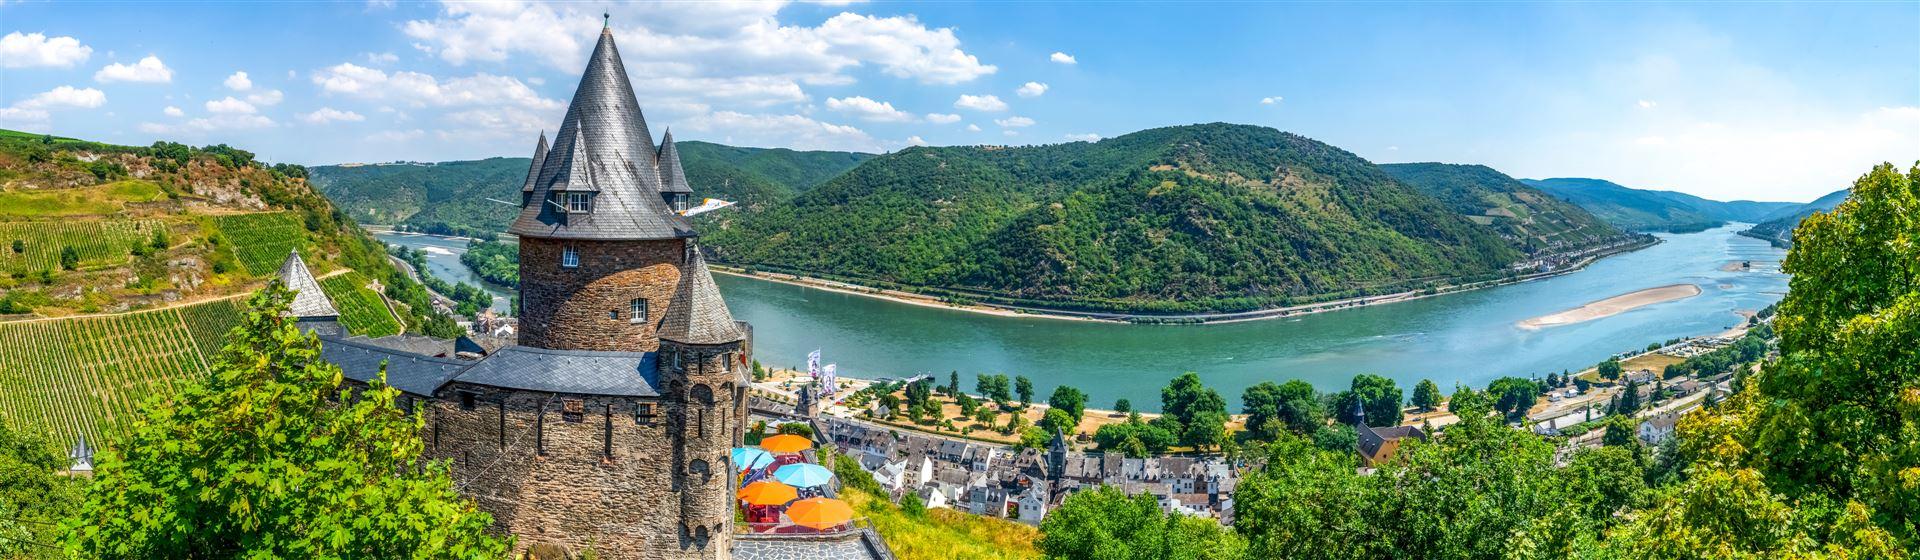 "<img src=""rhine-shutterstock_1143403328.jpeg"" alt=""The Rhine""/>"